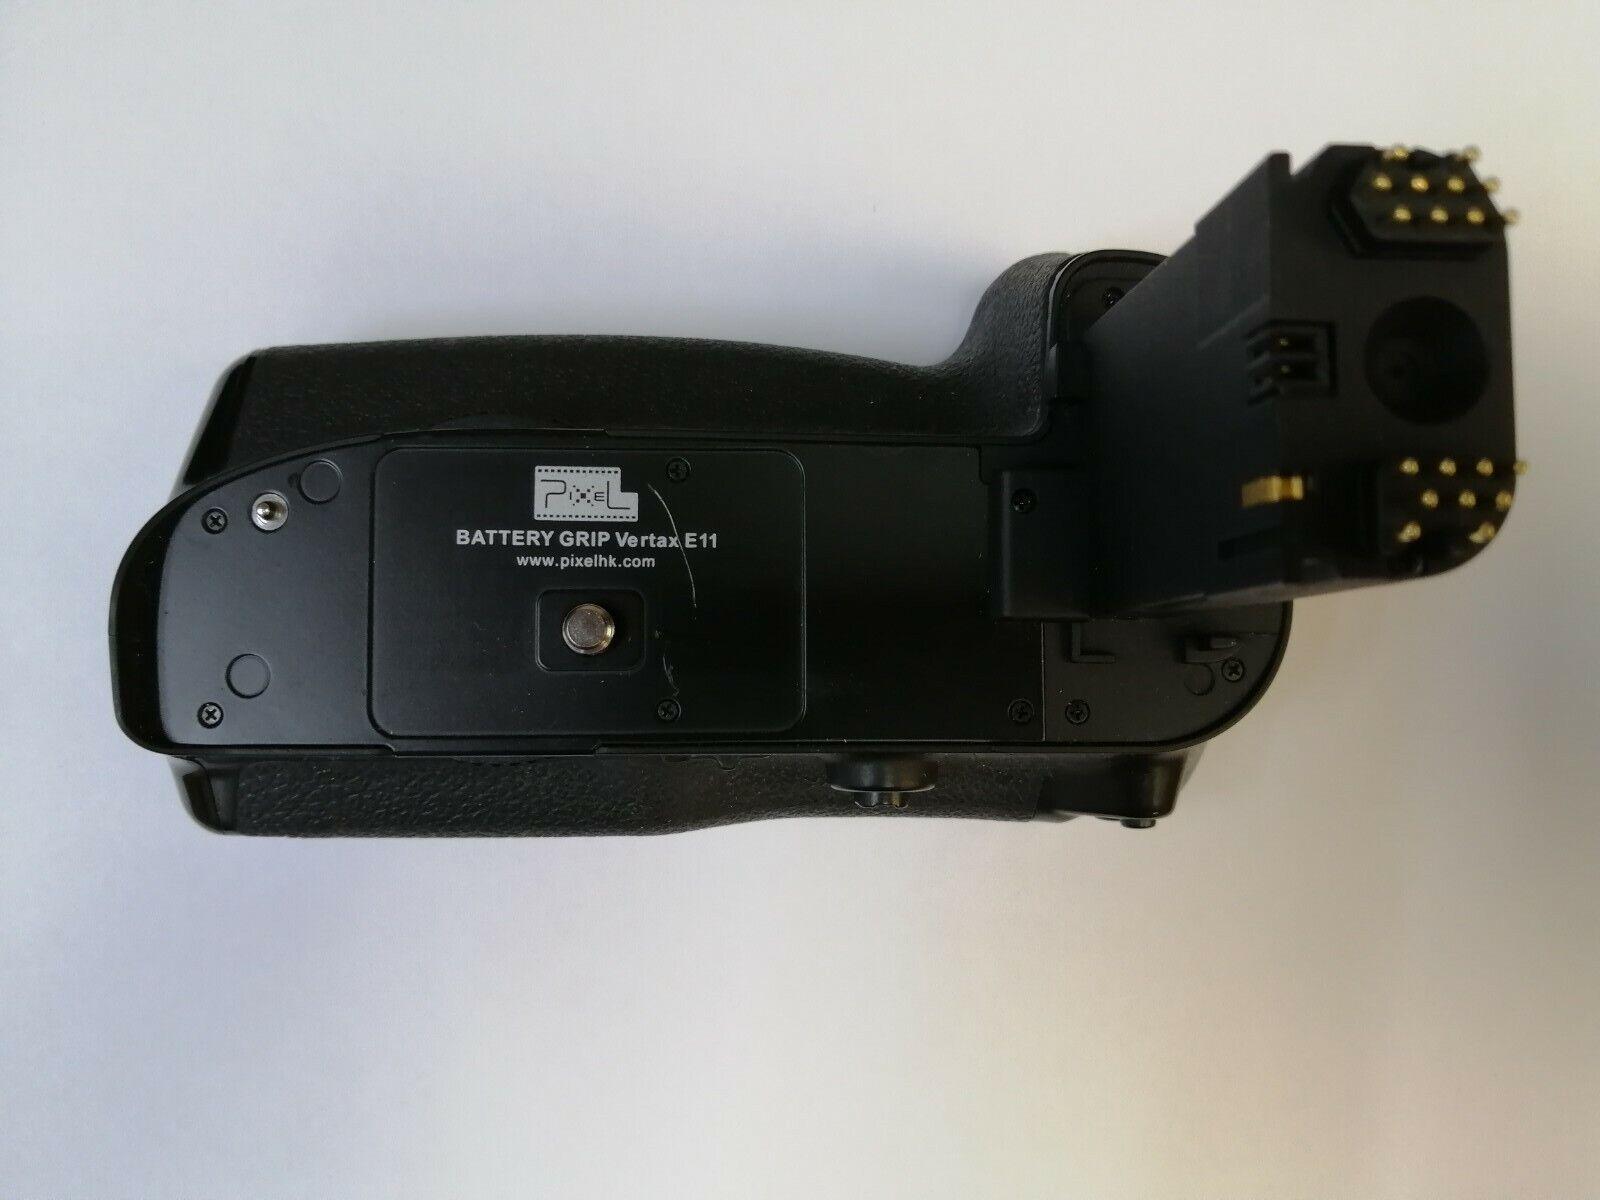 PIXEL Vertax E11 Battery Grip for Canon 5D Mark III, 5DS, & 5DS R BG-E11